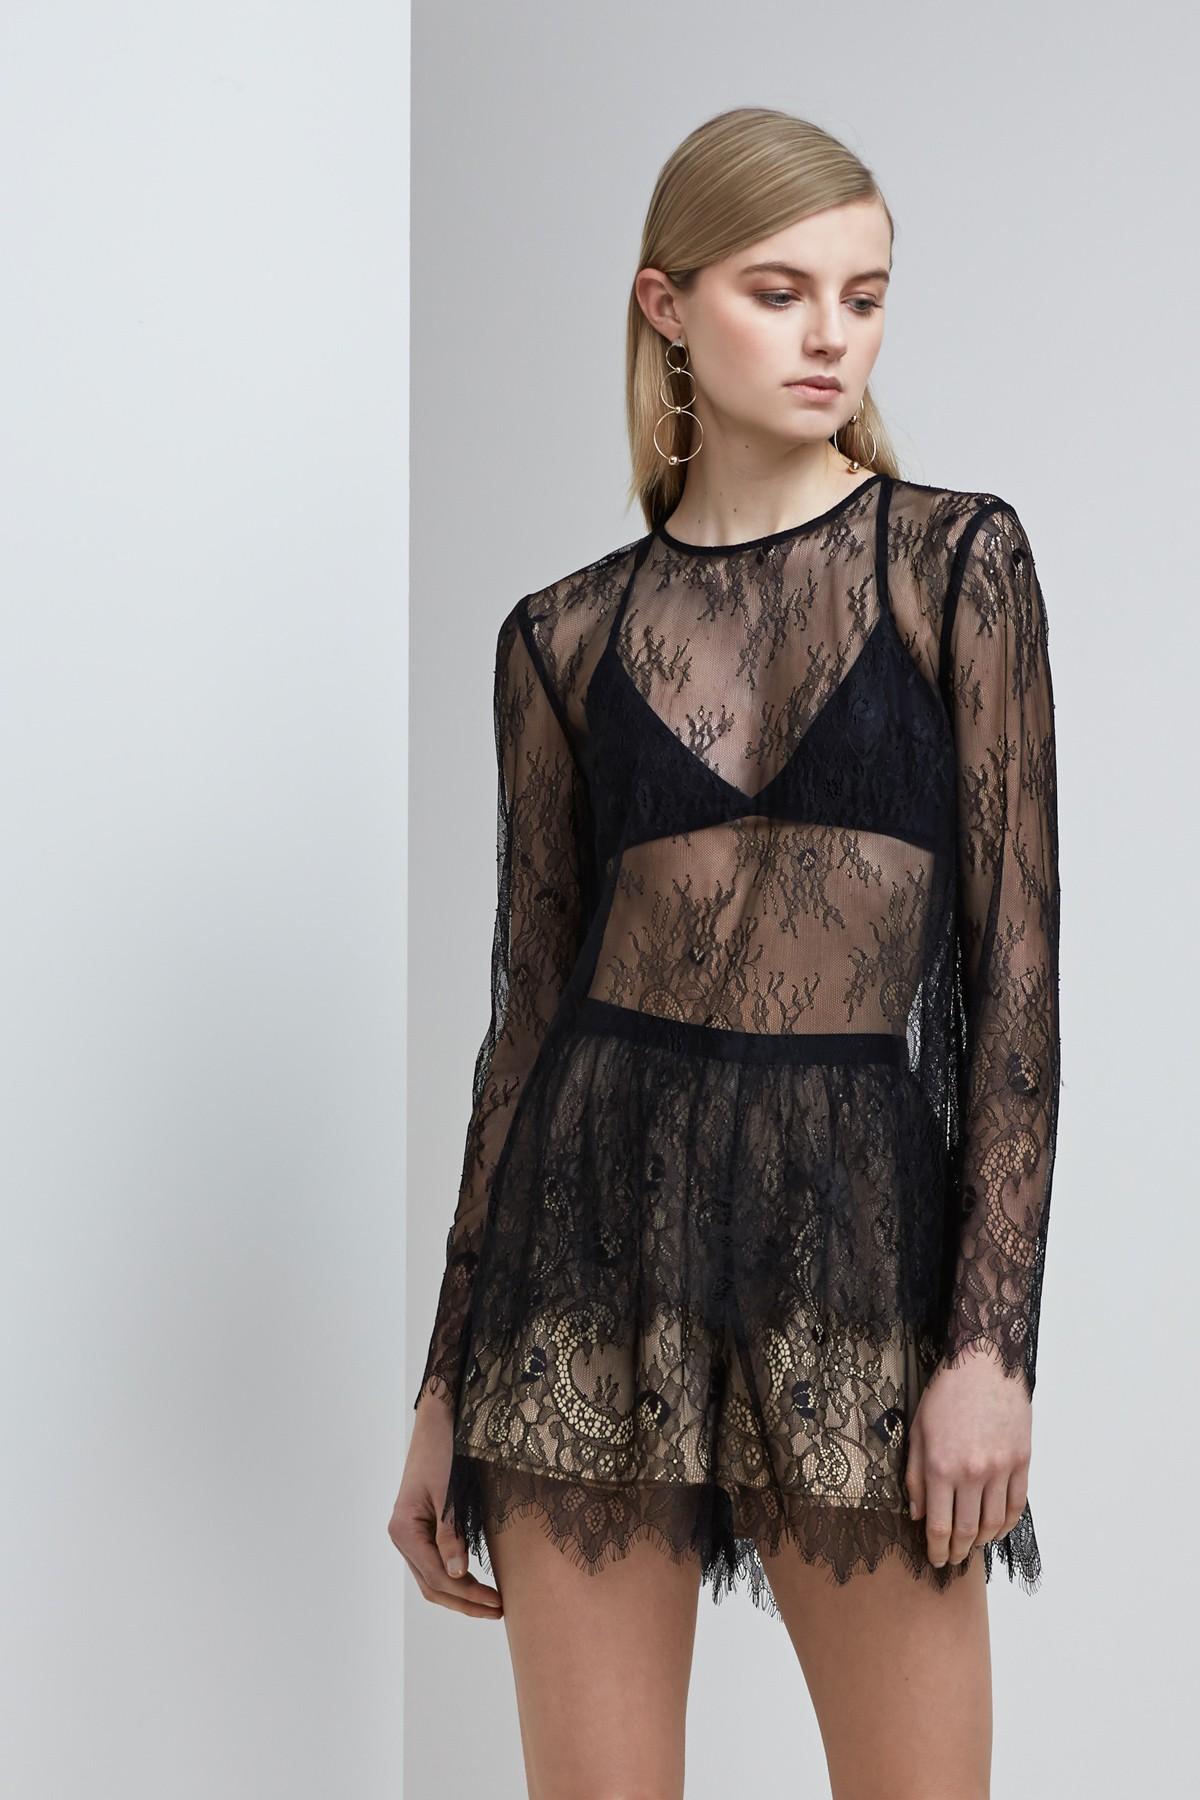 Shop  Keepsake Above Water Lace L/S Top  +  Lace Shorts .